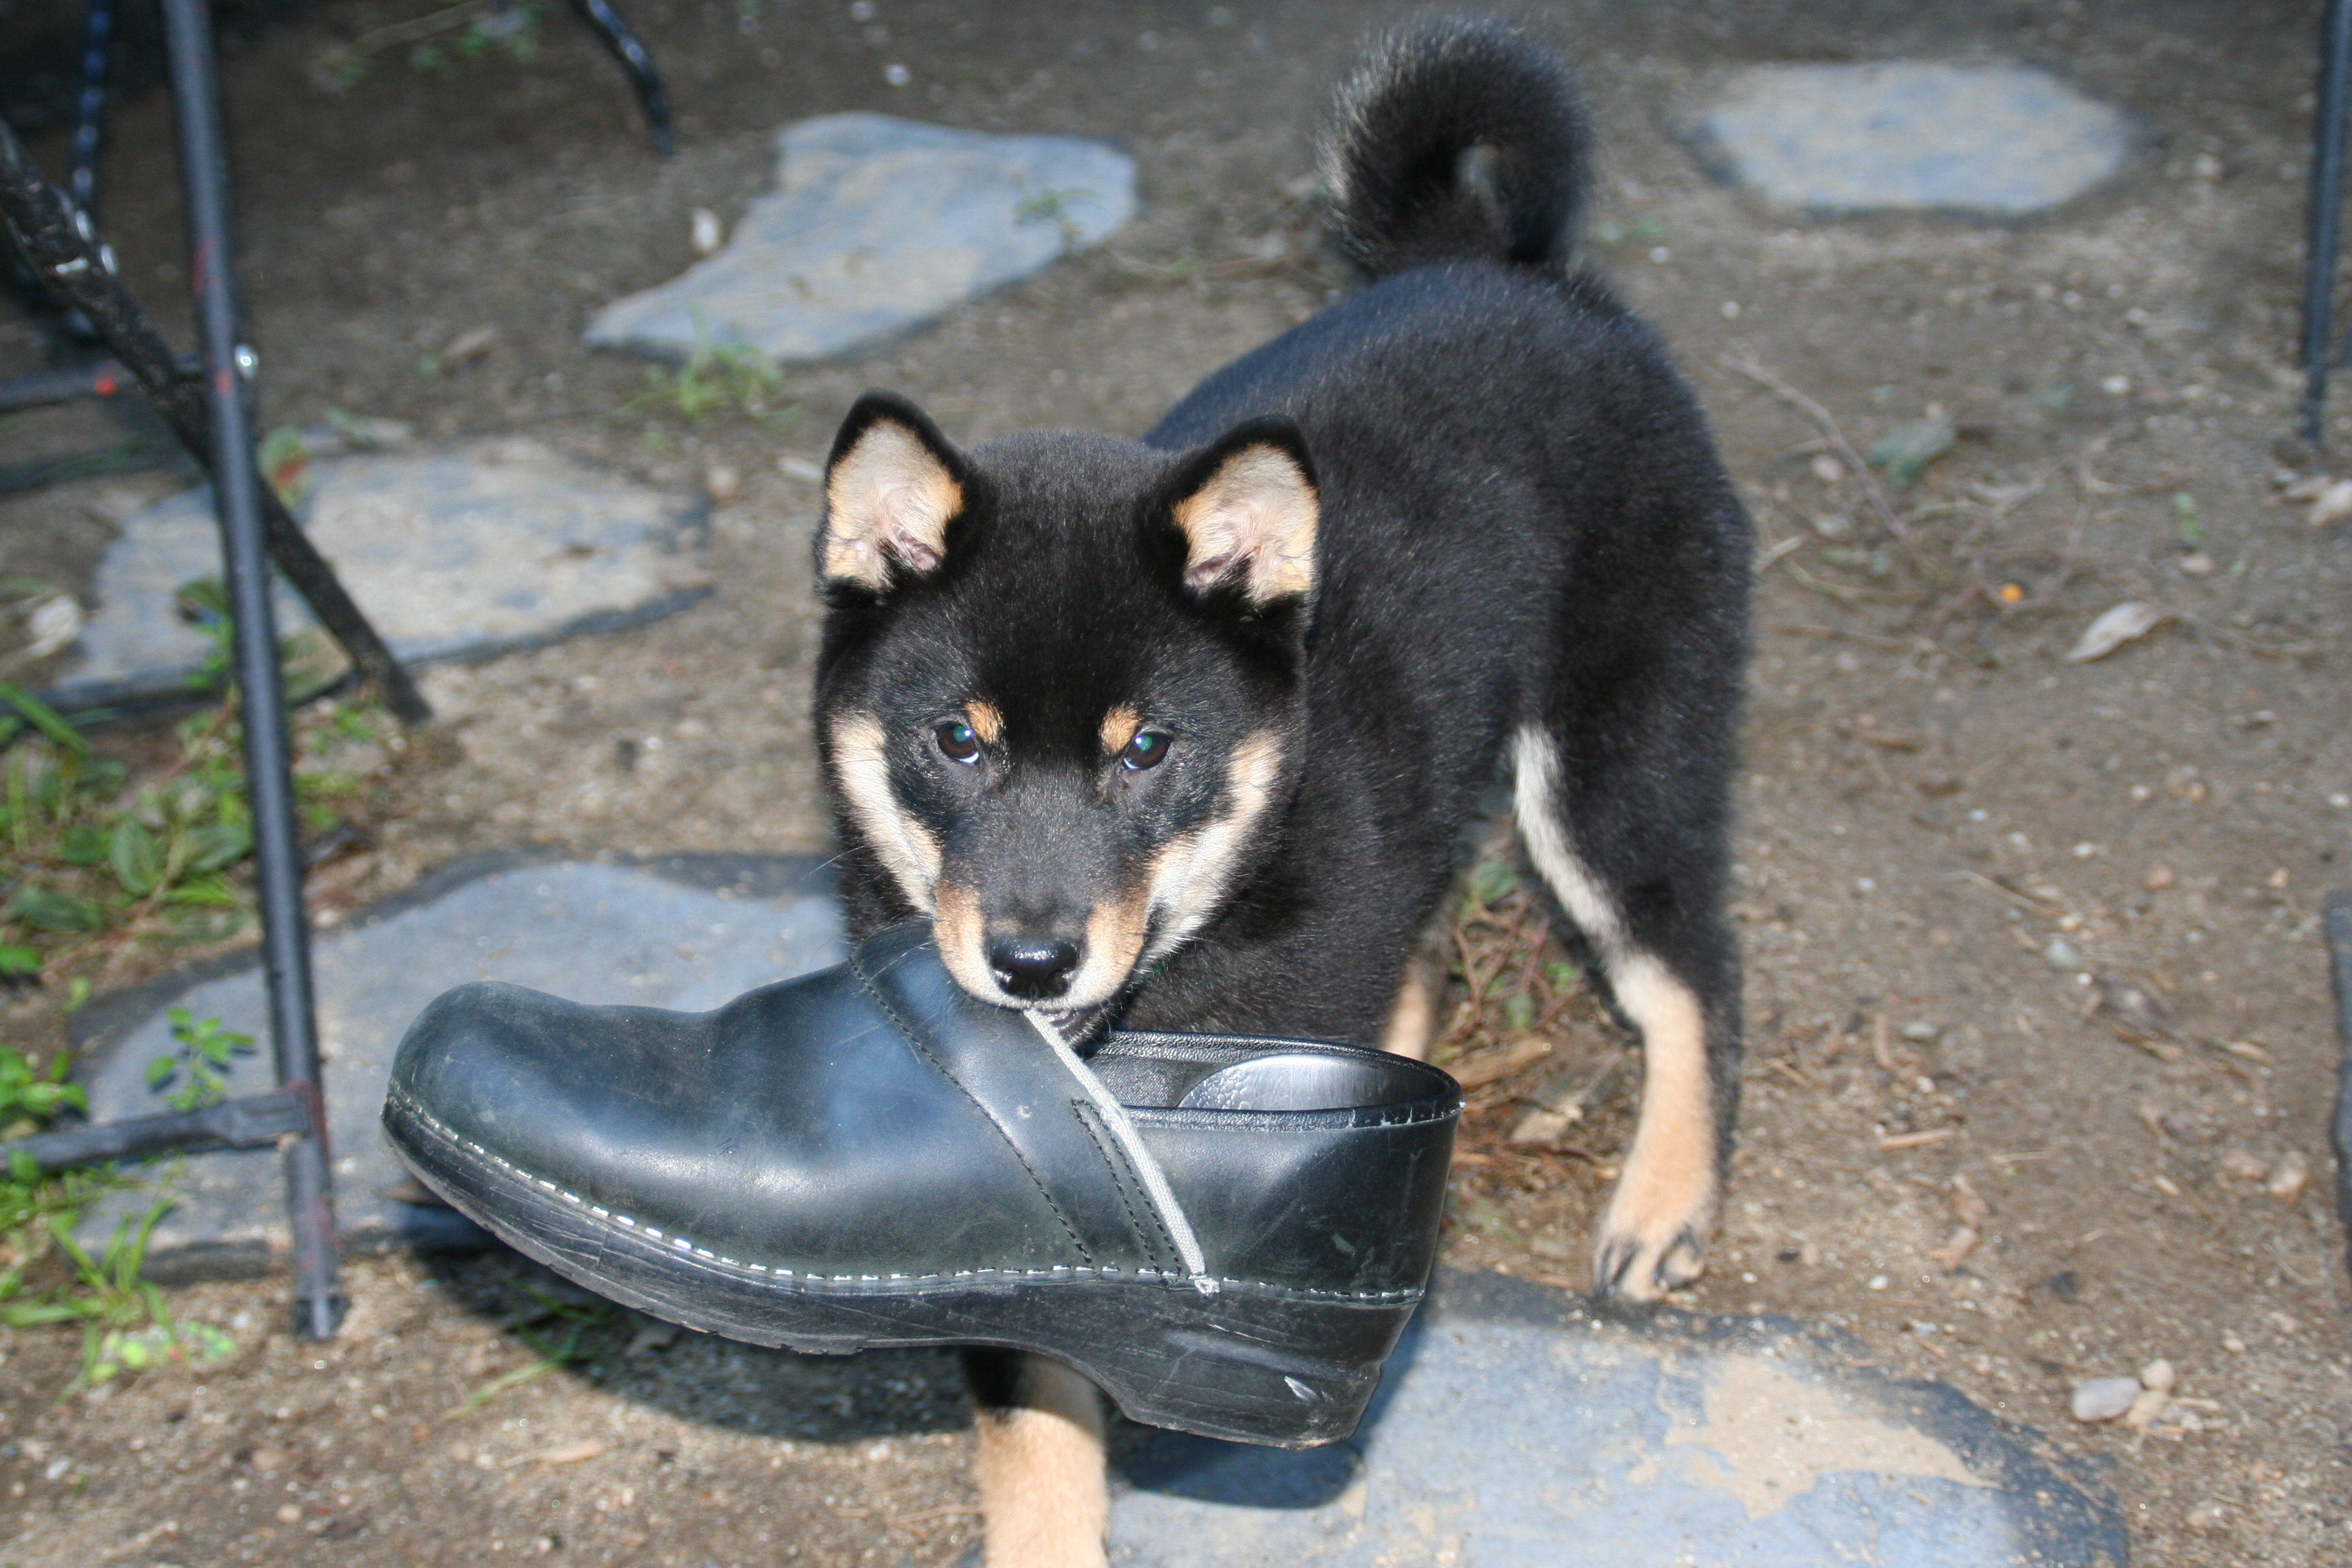 Bosco, the wonder dog